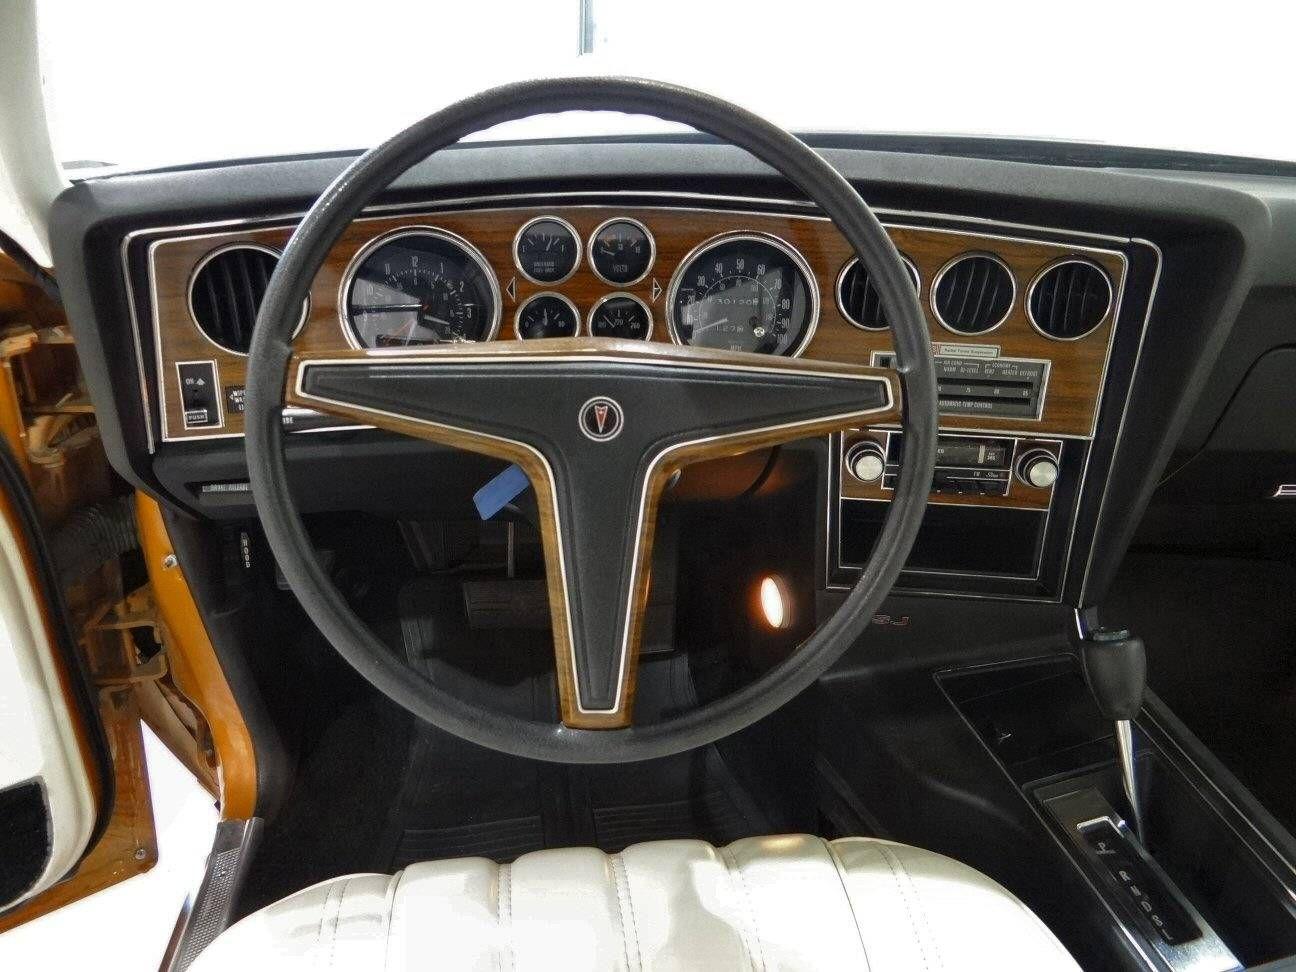 1977 Pontiac Grand Prix 2 Dr For Sale Hemmings Motor News Pontiac Grand Prix Pontiac Grand Prix Cars